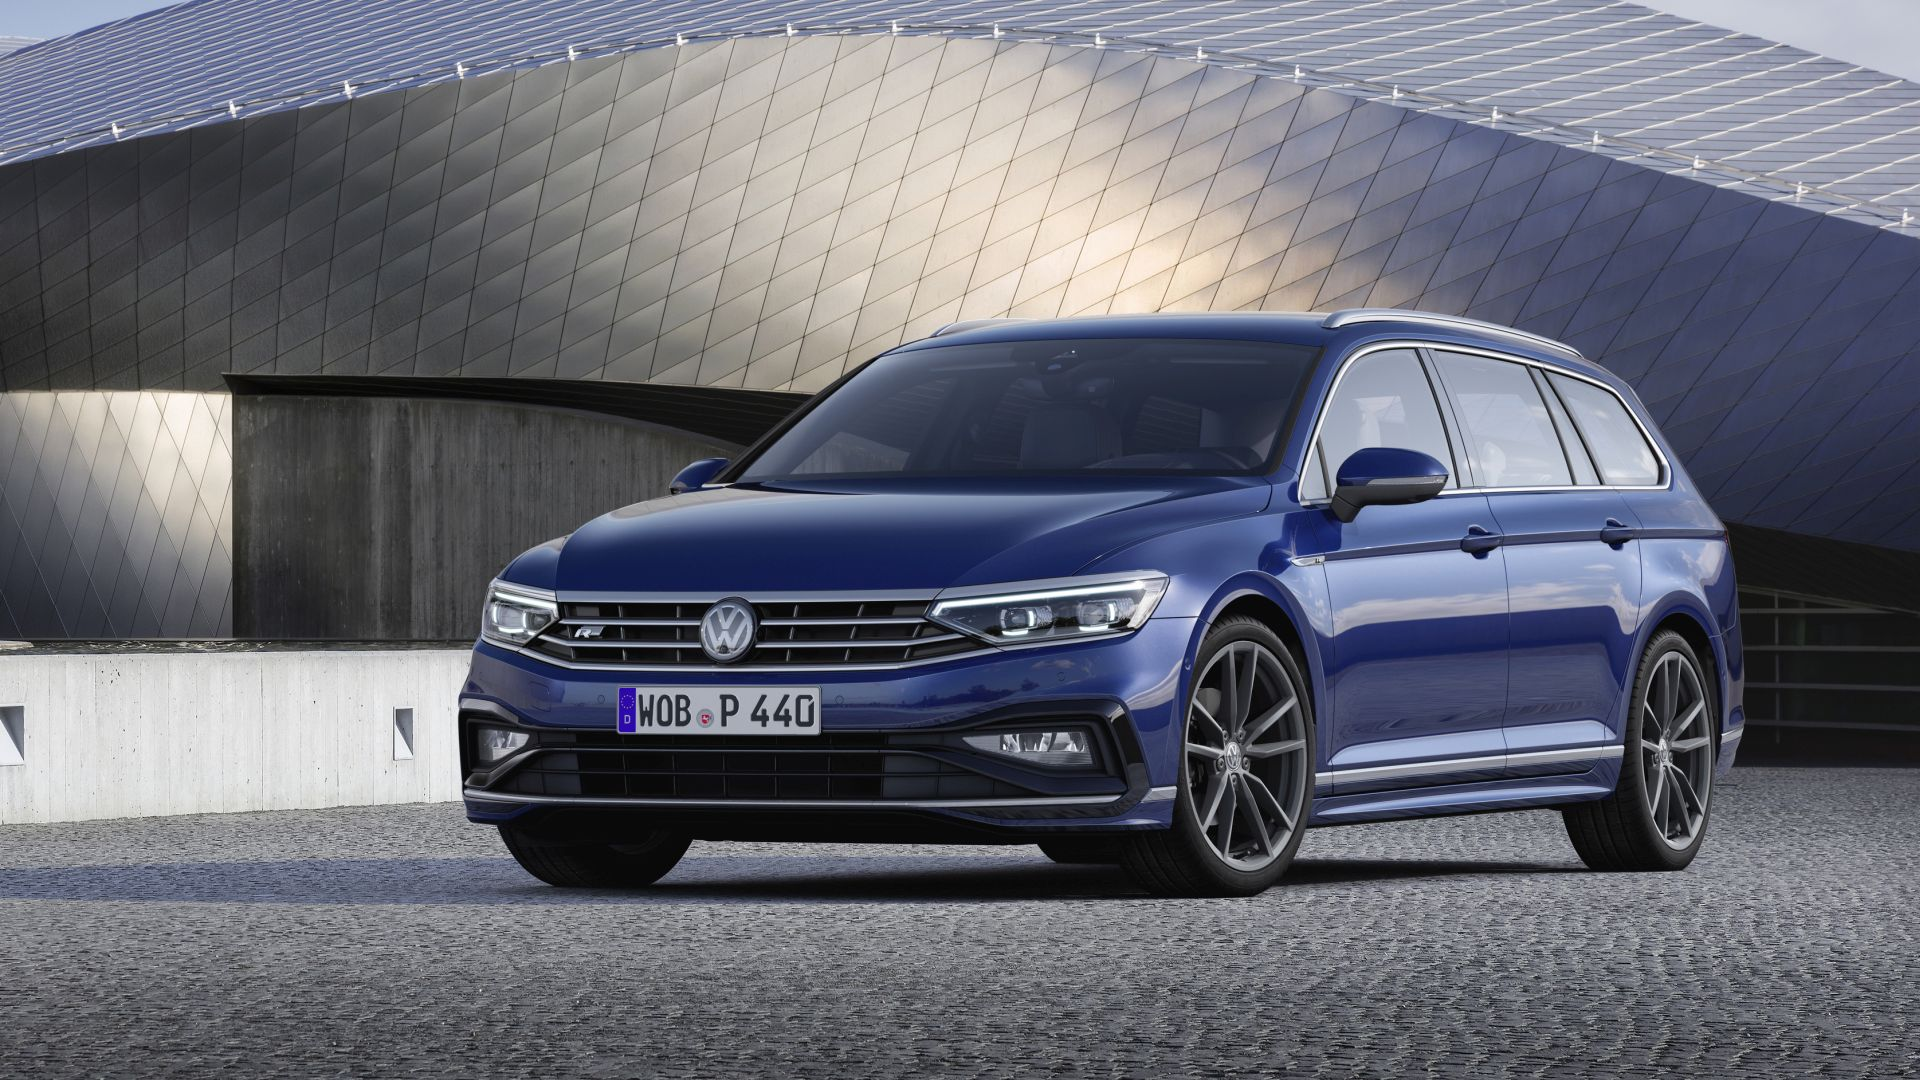 Vynoveny Volkswagen Passat Viac Iq Viac Online